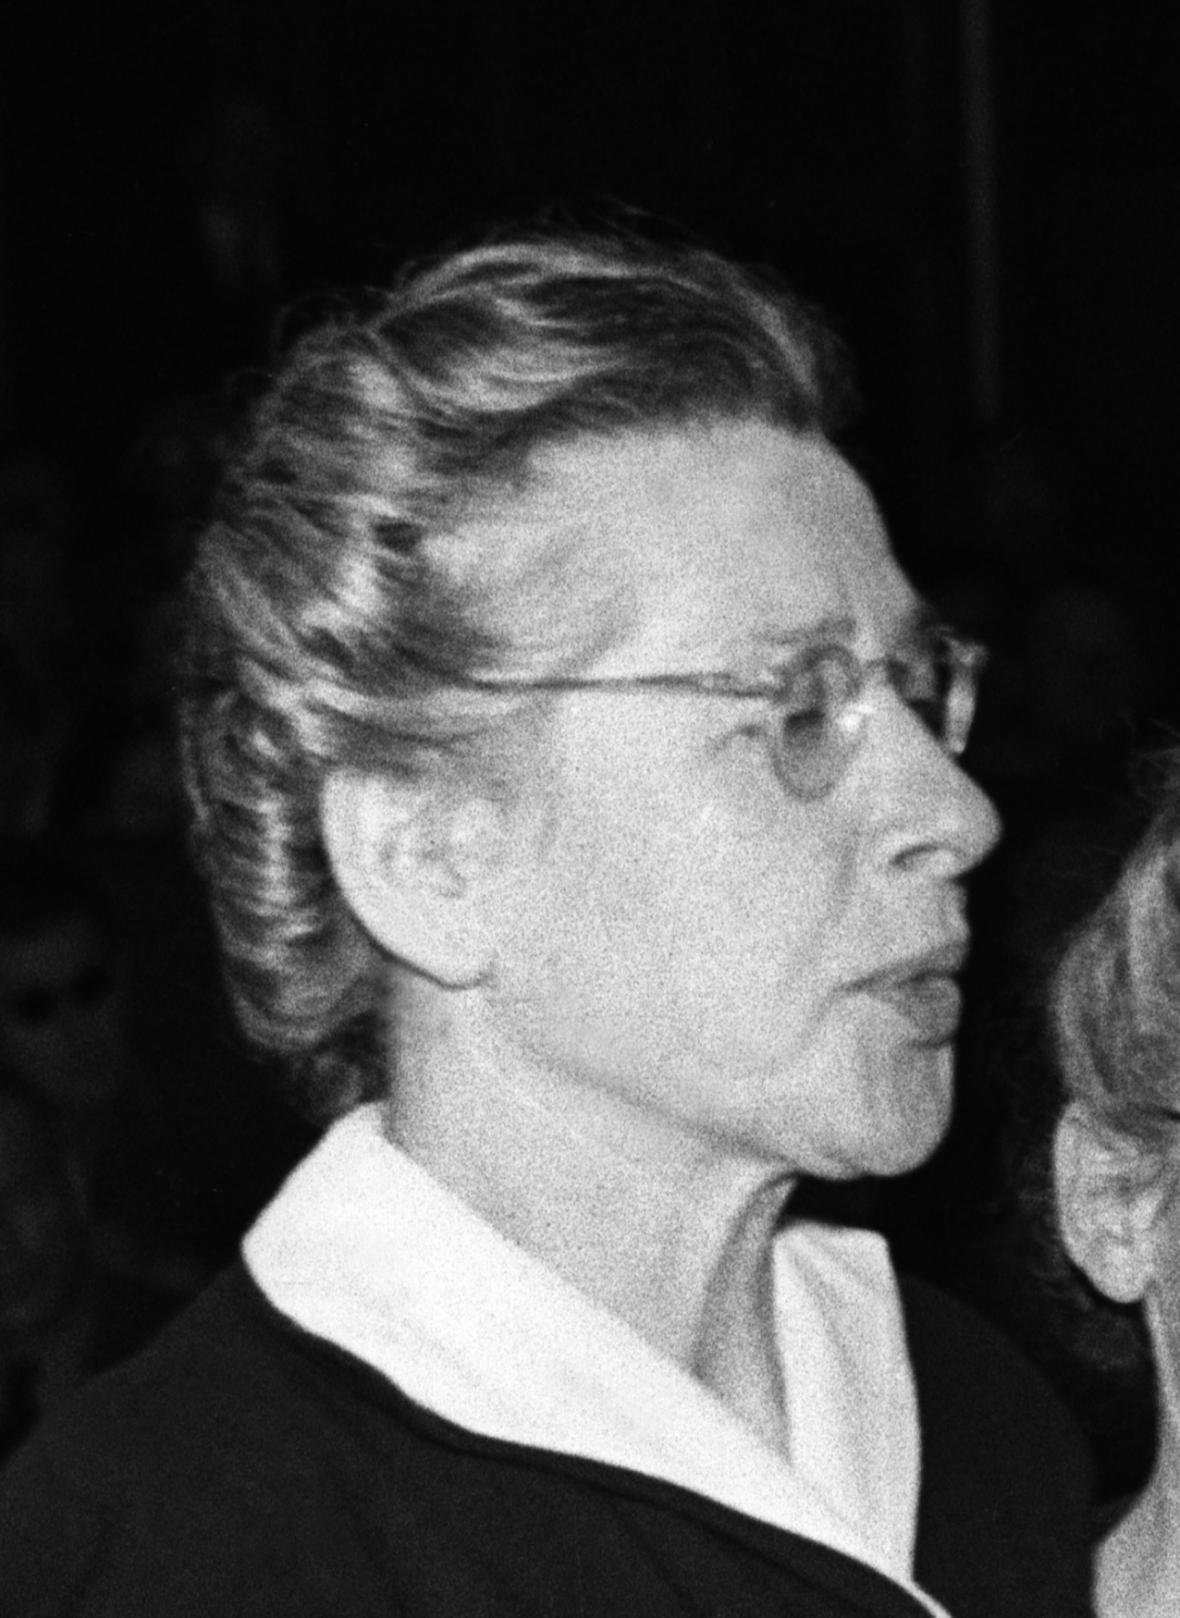 Milada Horáková - 4. 6. 1950